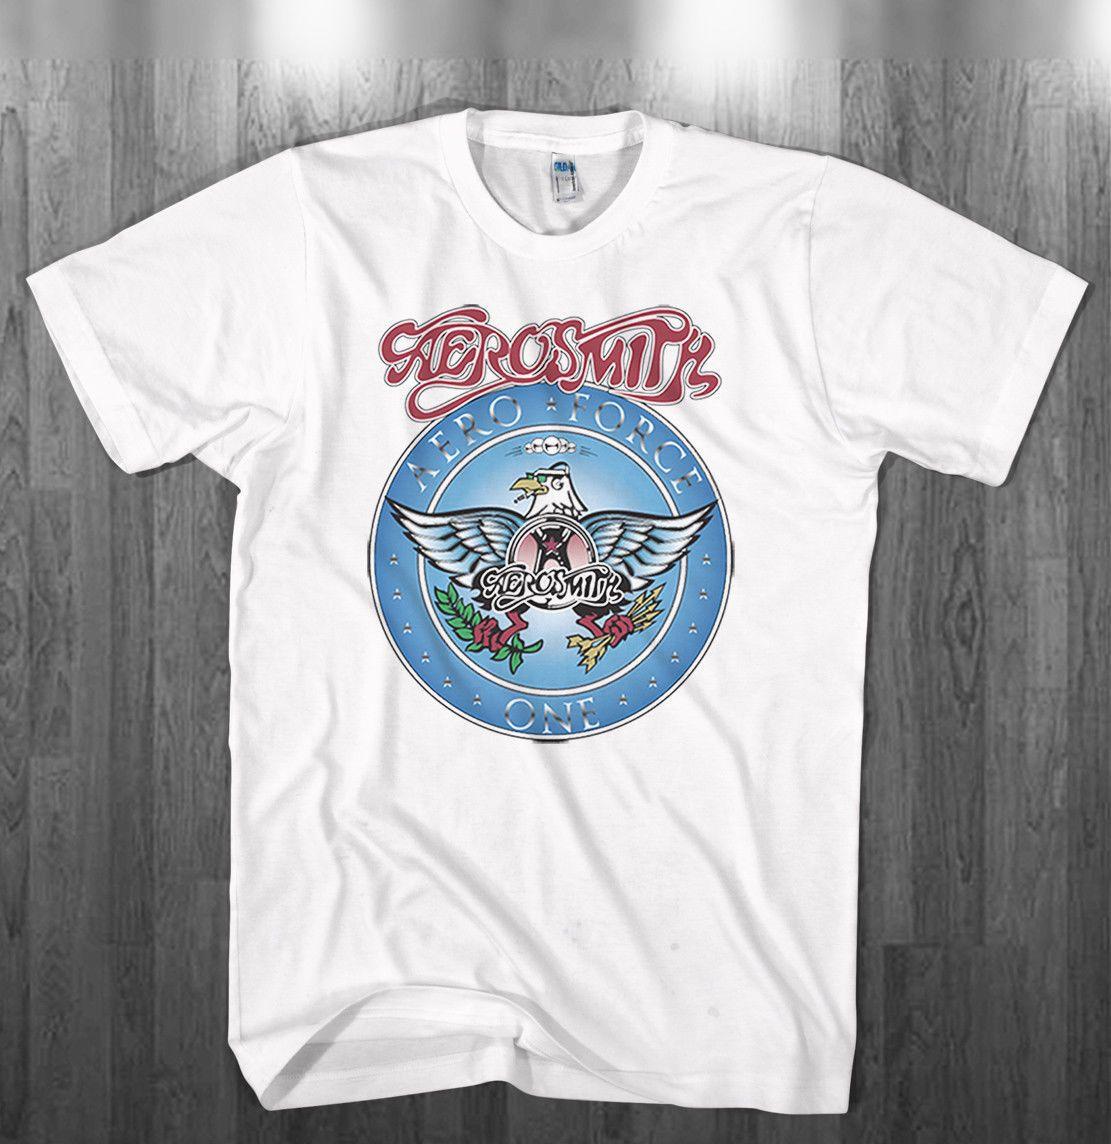 350a3d24 Wayne's World Garth Algar Aerosmith T-shirt Halloween Costume Mens Kids  Shirts